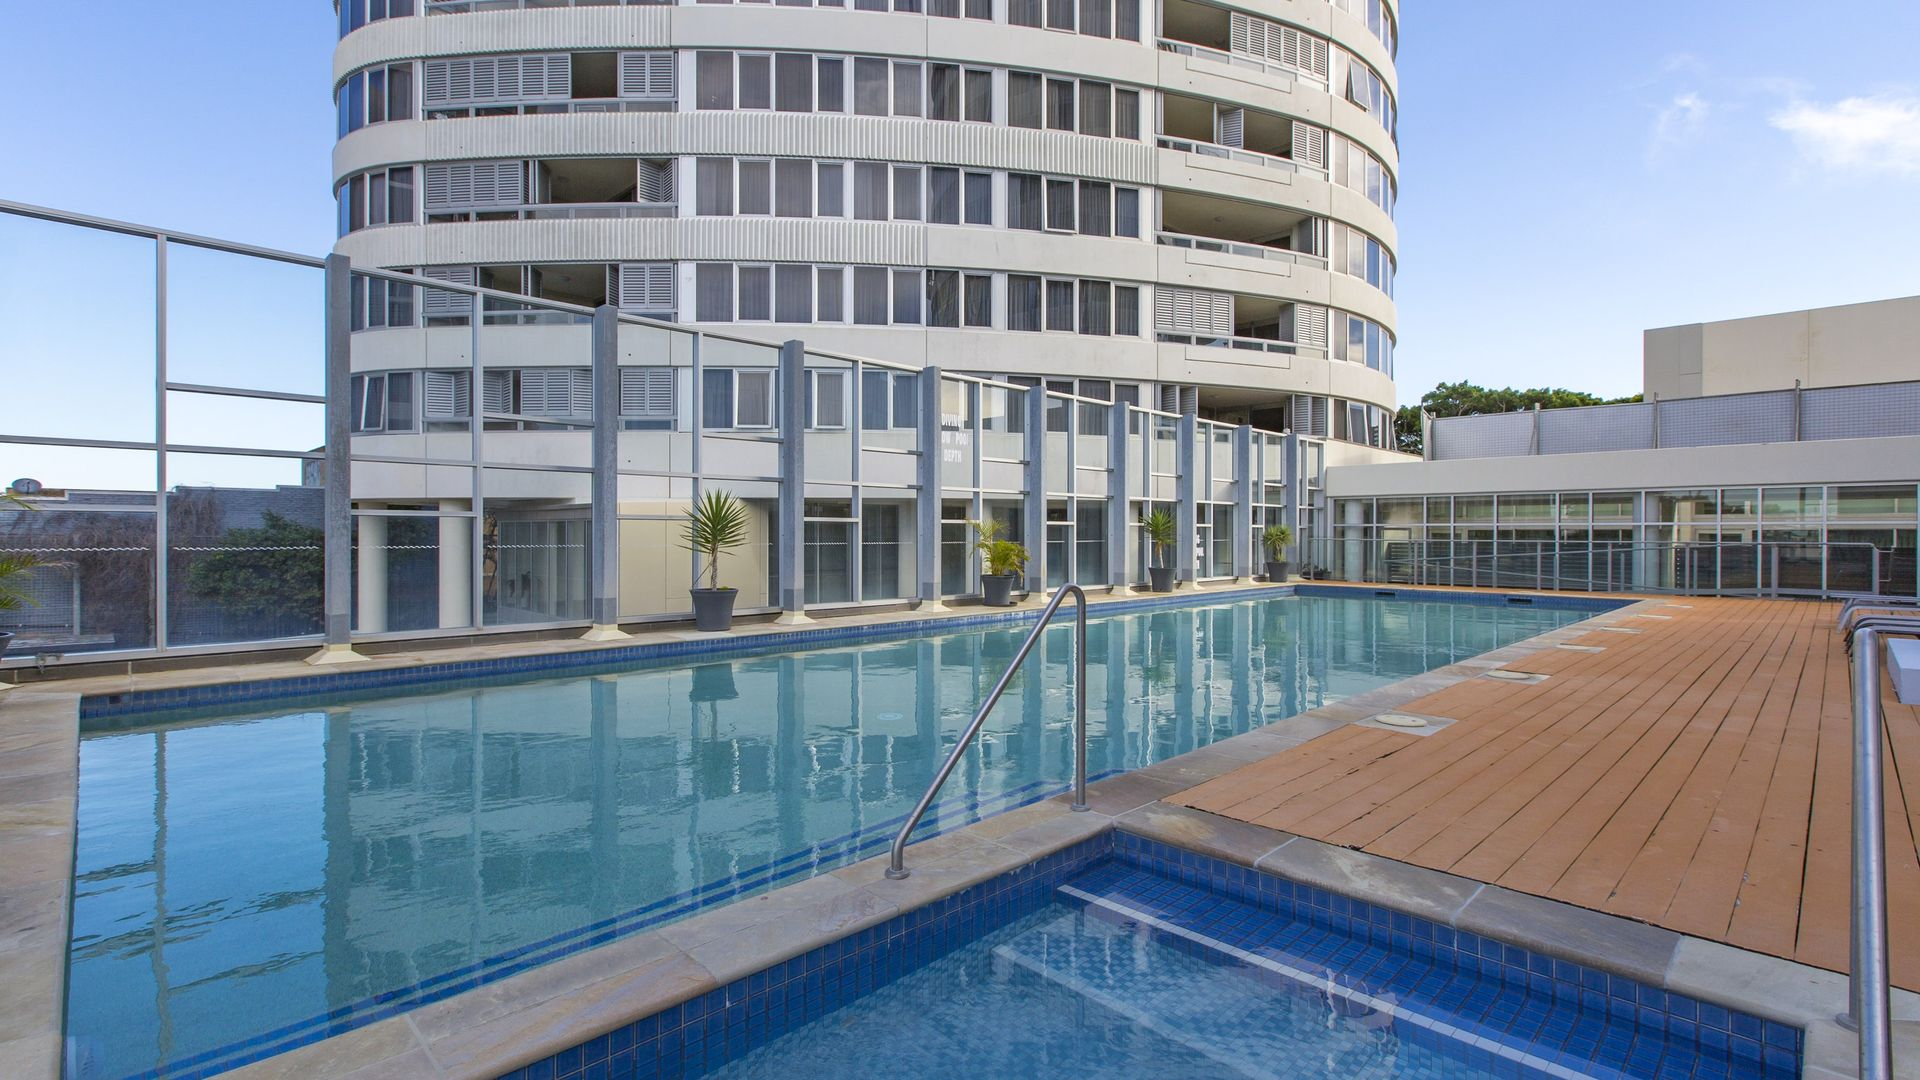 1031/18-20 Stuart Street, Tweed Heads NSW 2485, Image 1